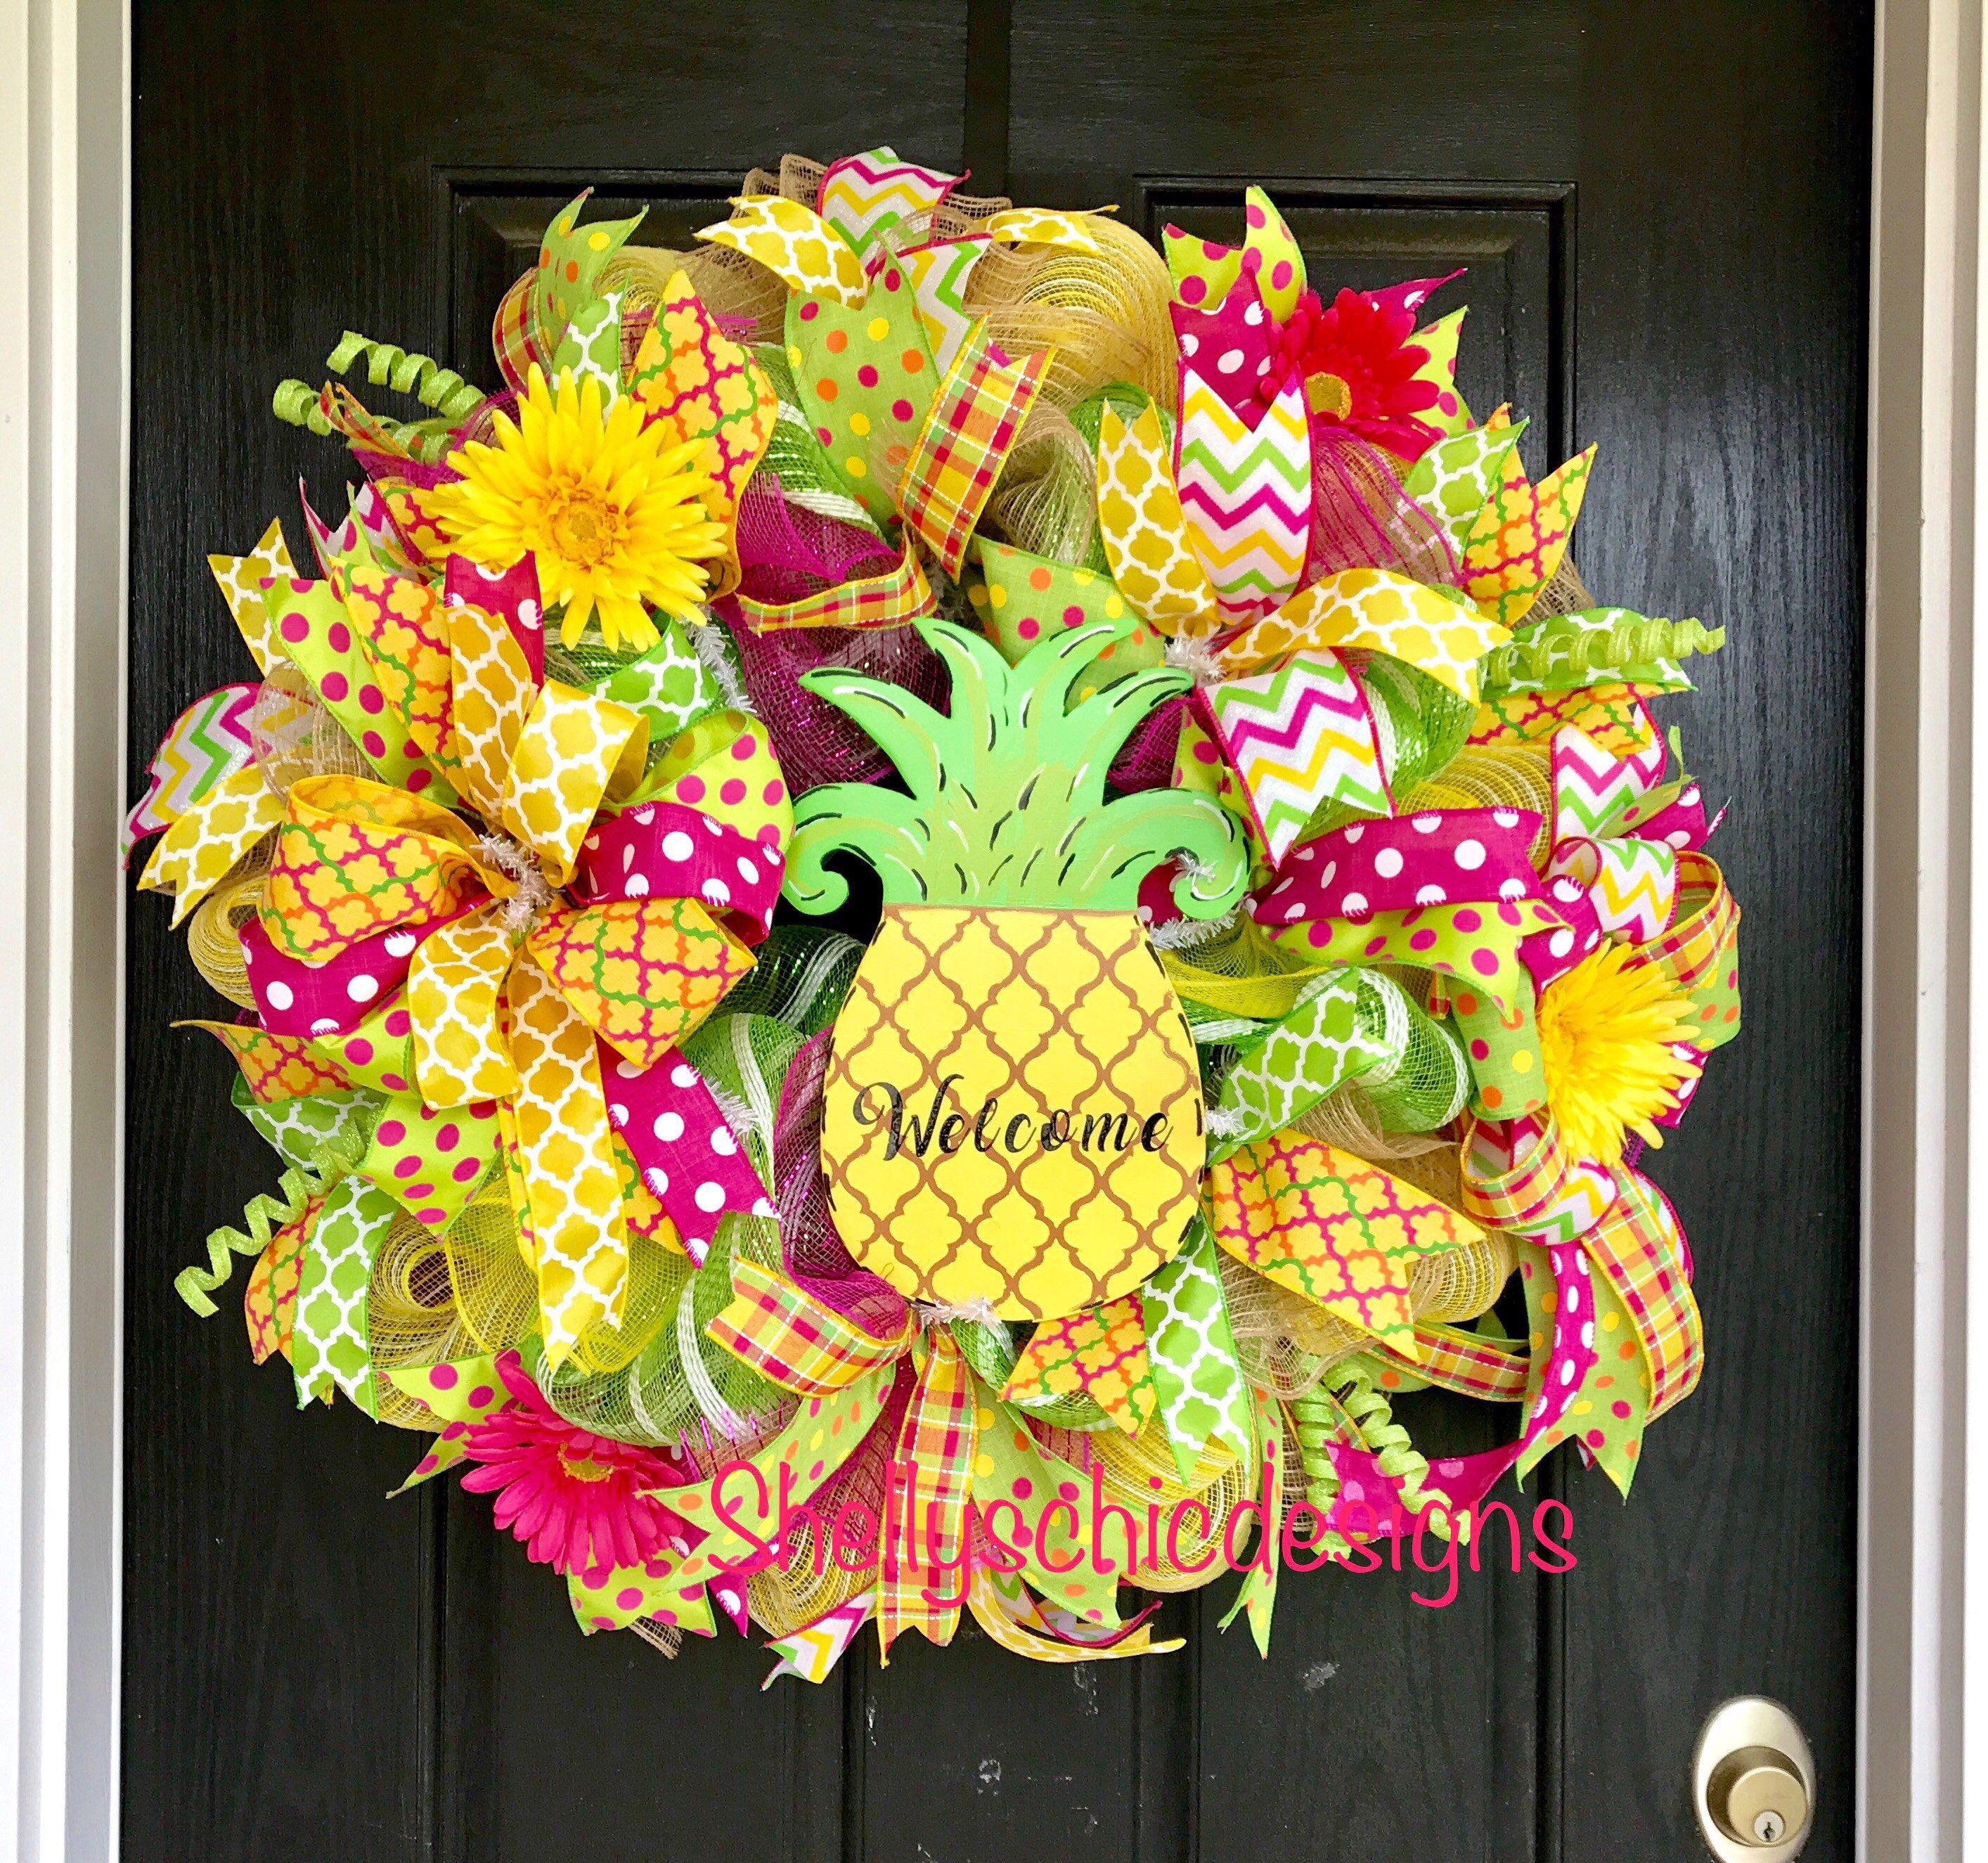 Photo of Summer Deco Mesh Wreath, Pineapple Wreath, Large Summer Mesh Wreath, Welcome Wreath, Welcome Wreath, Summer Wreath, Front Door Wreath,